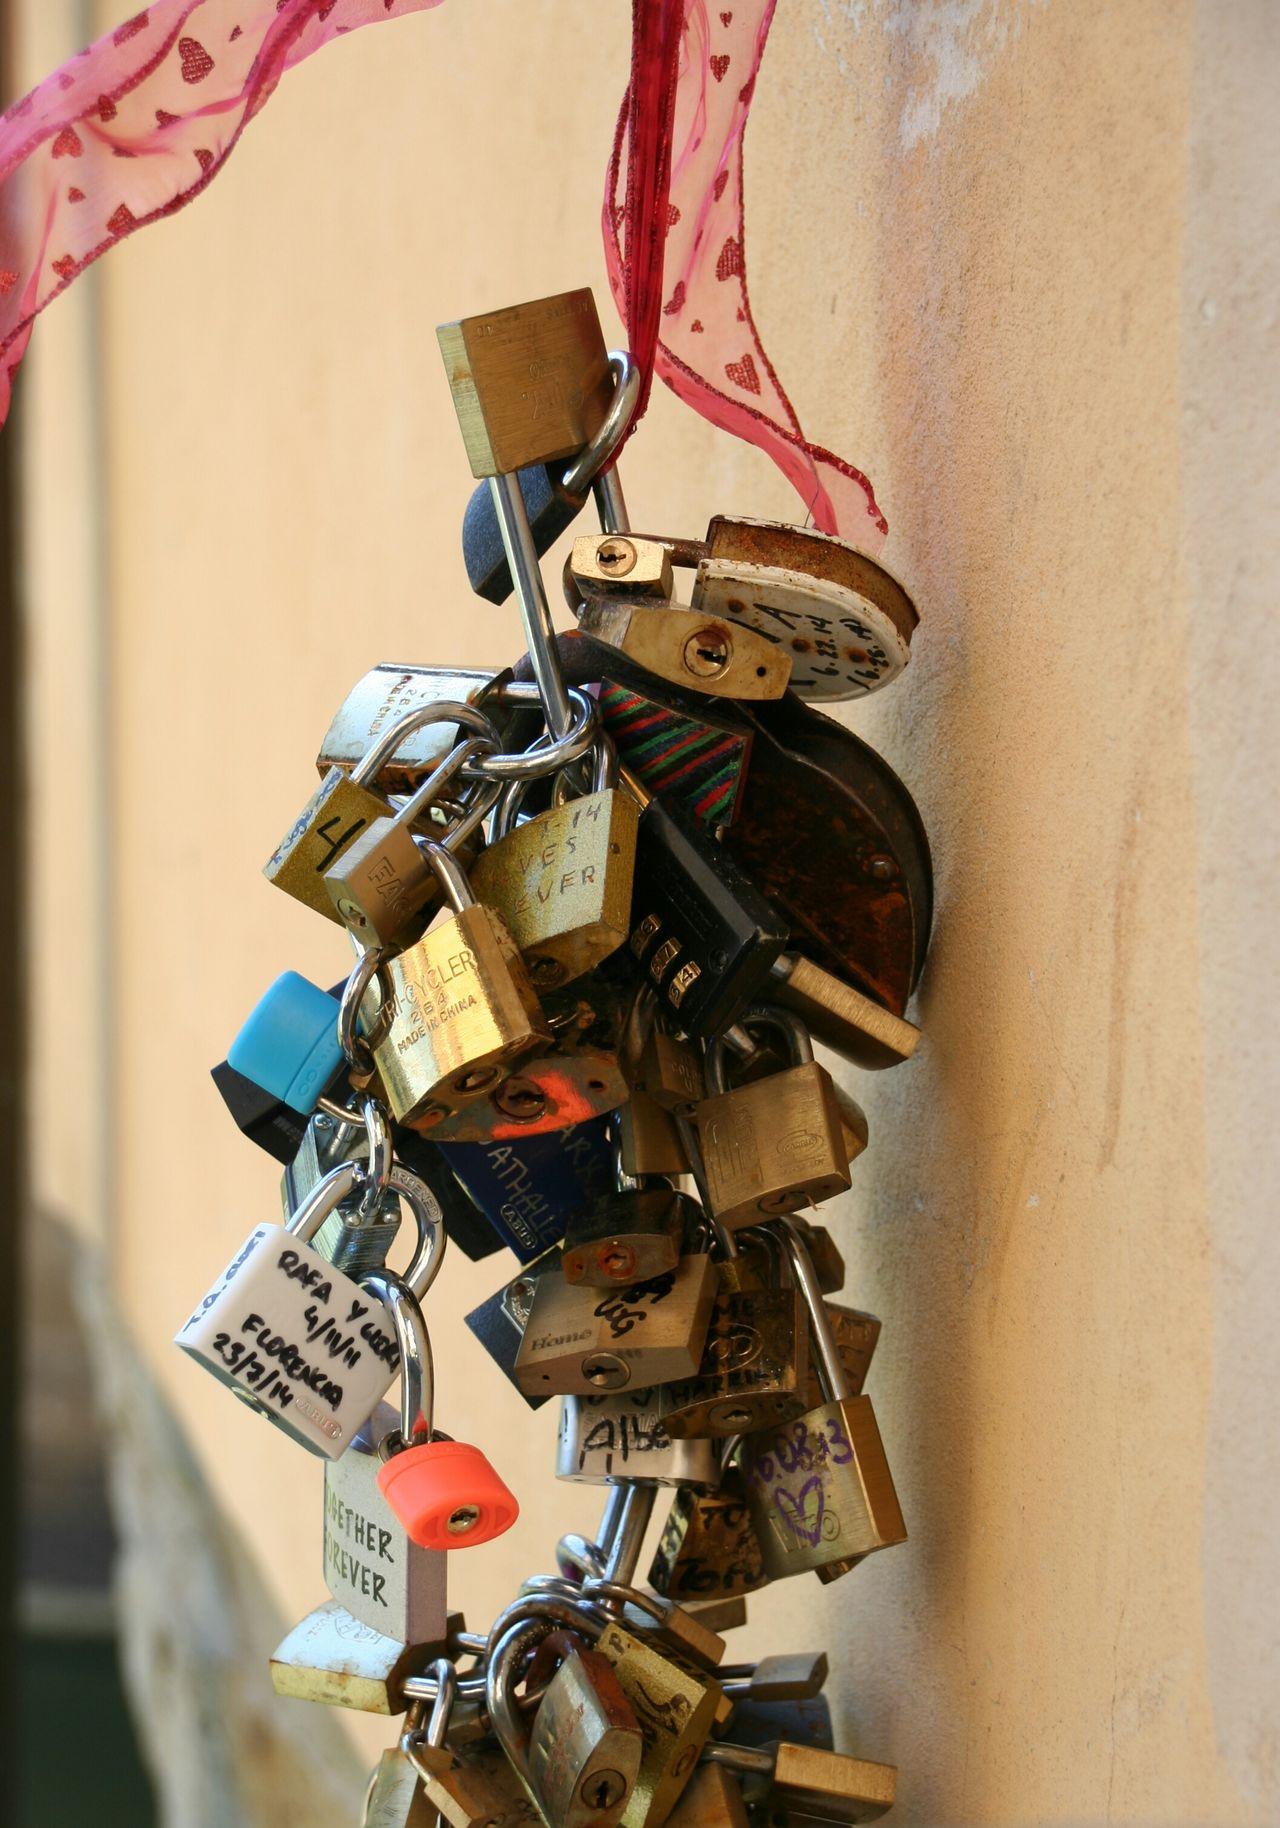 Les cadenas du Ponte Vecchio Firenze Firenze With Love Ponte Vecchio - Firenze Firenze Reminiscences